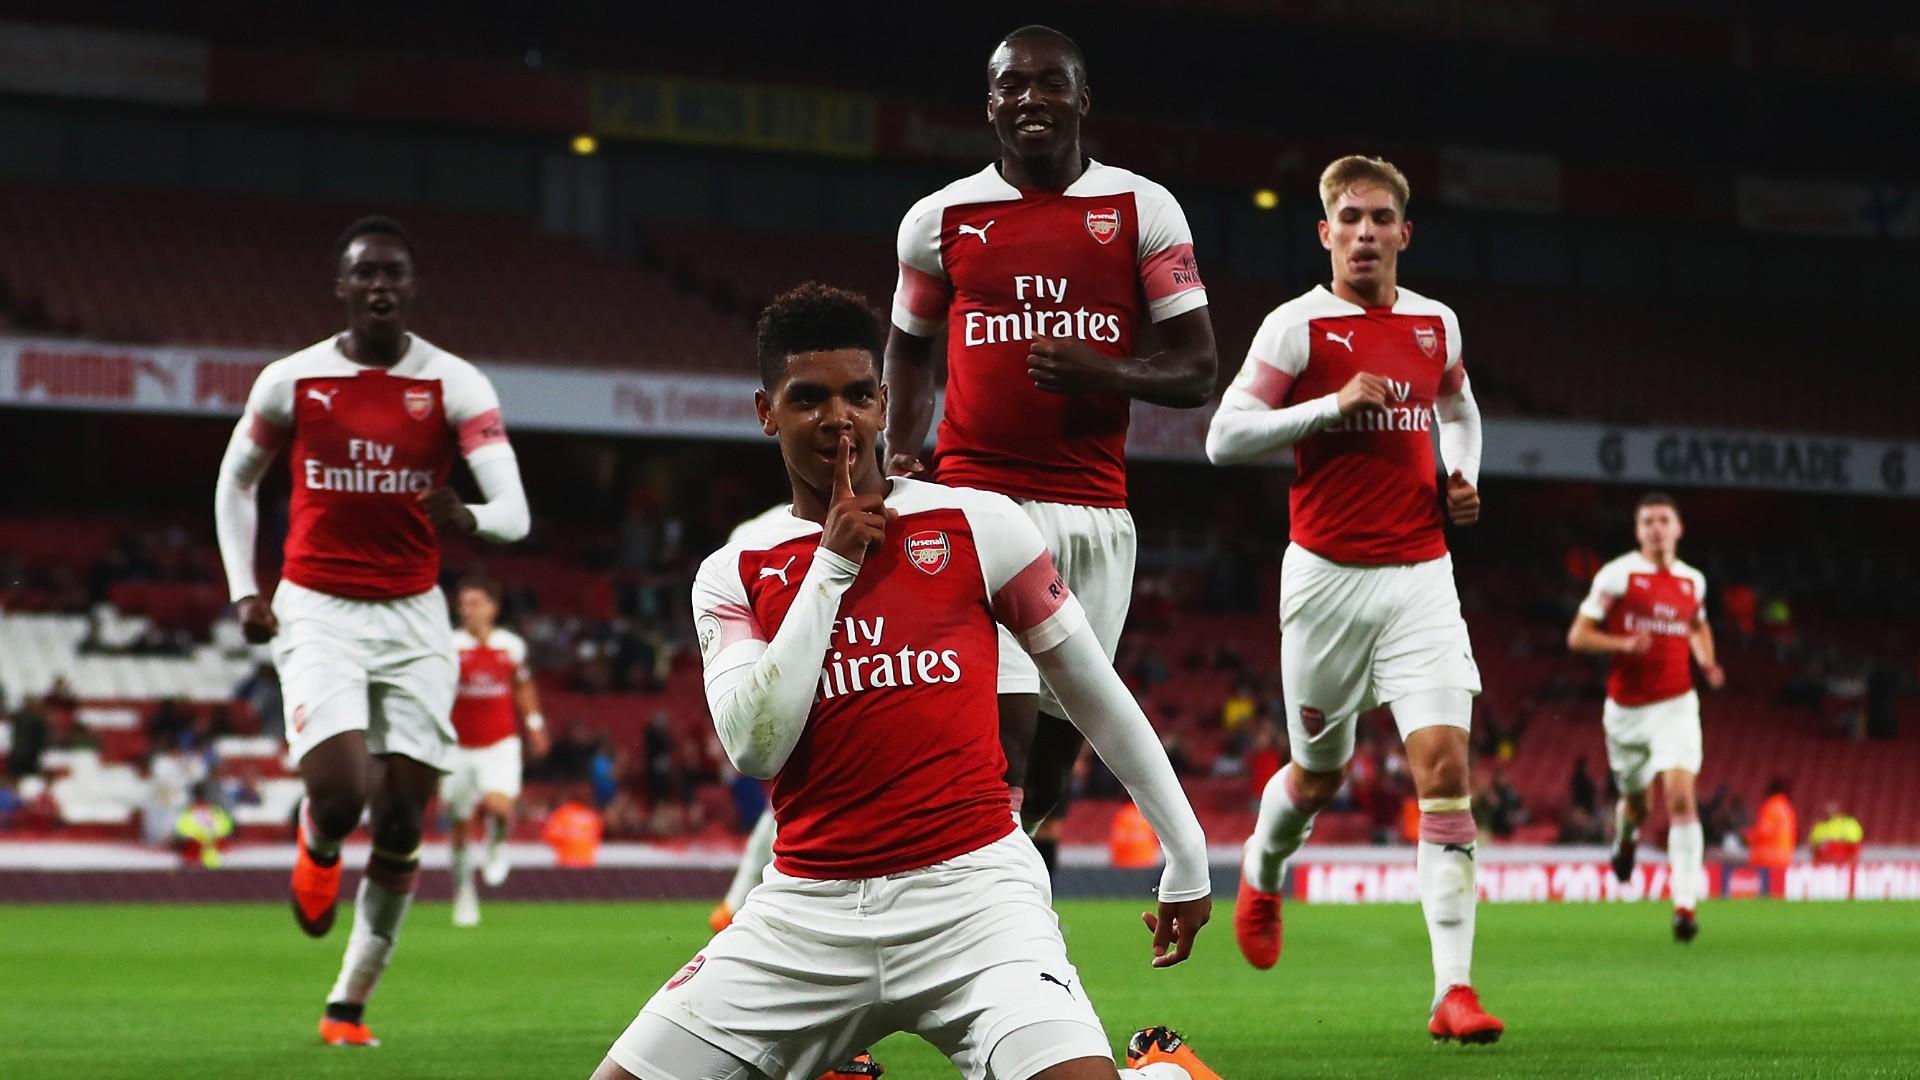 Tyreece John-Jules Arsenal 2018/19